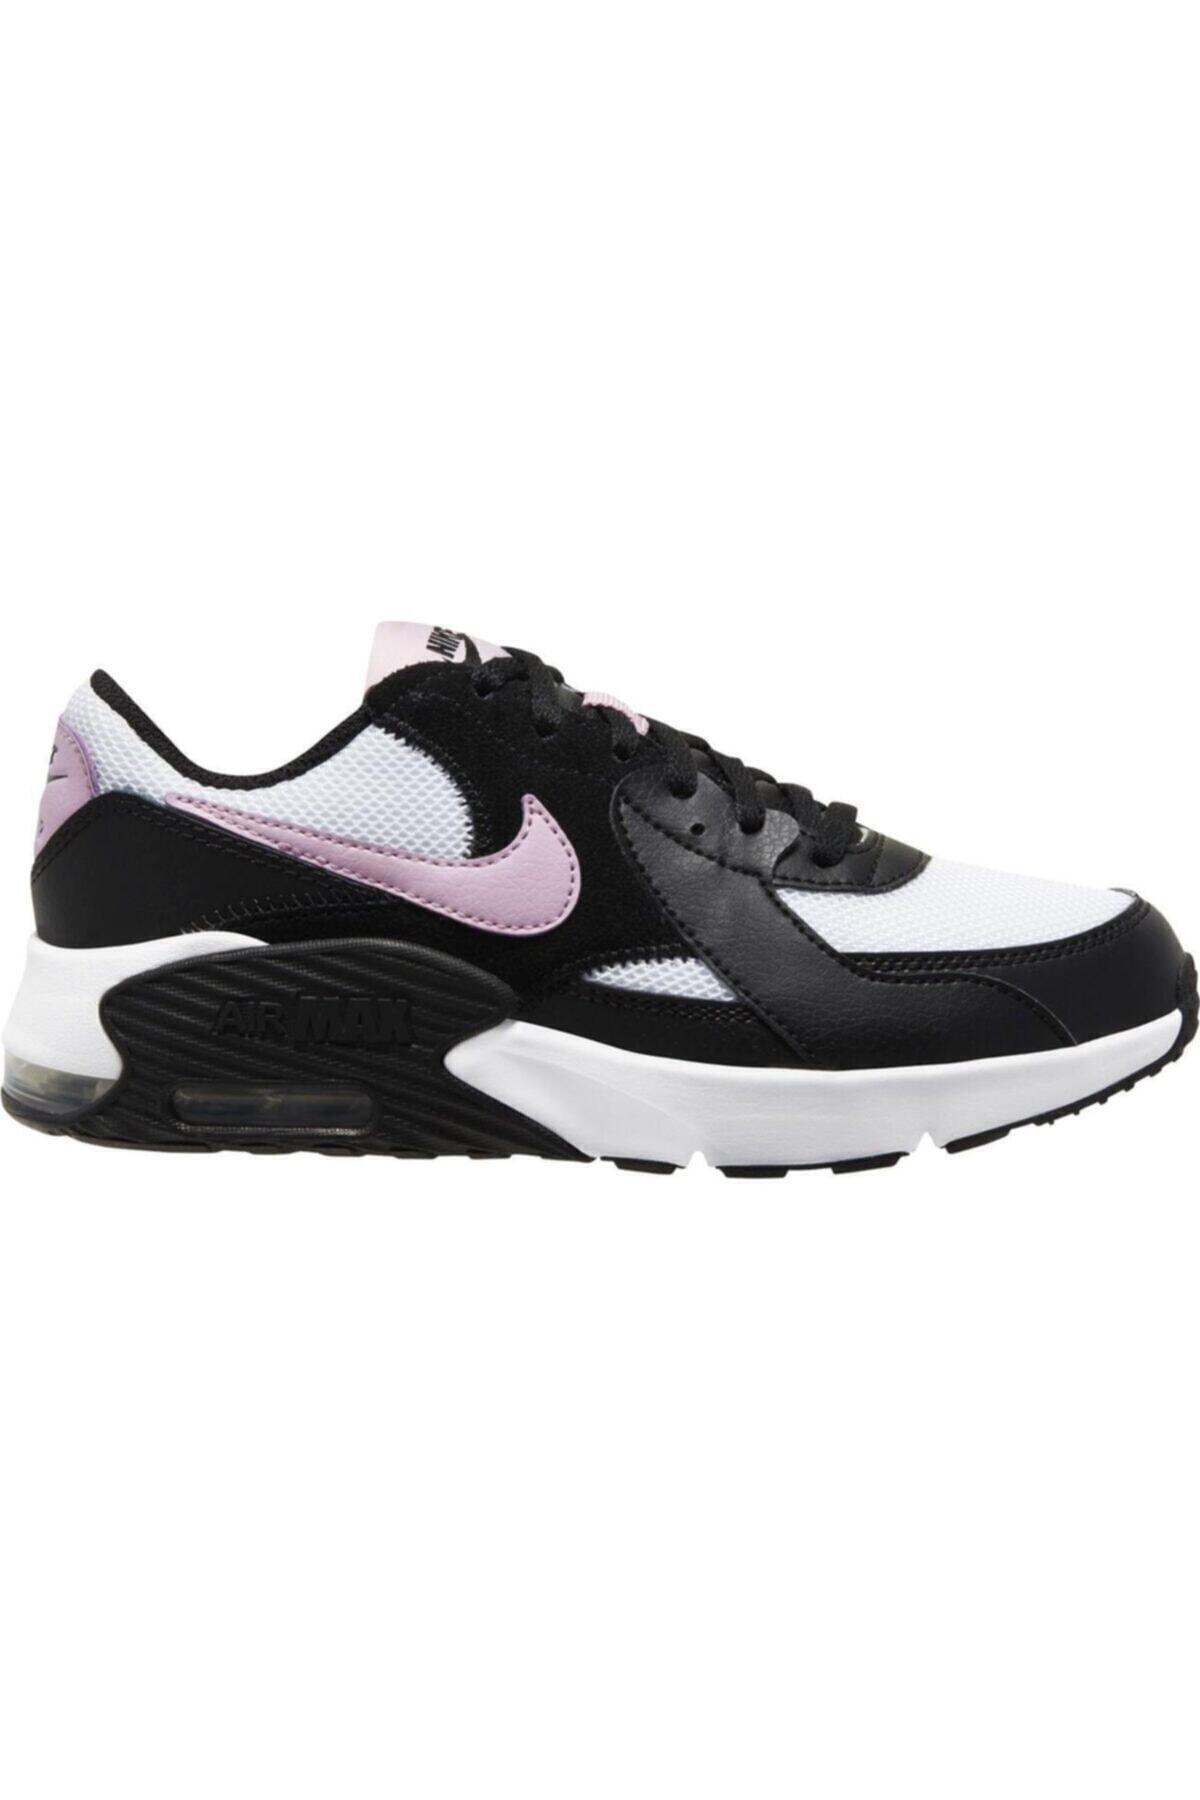 Nike Kadın Spor Ayakkabı Air Max Excee Cd6894-004 Cd6894-004 1